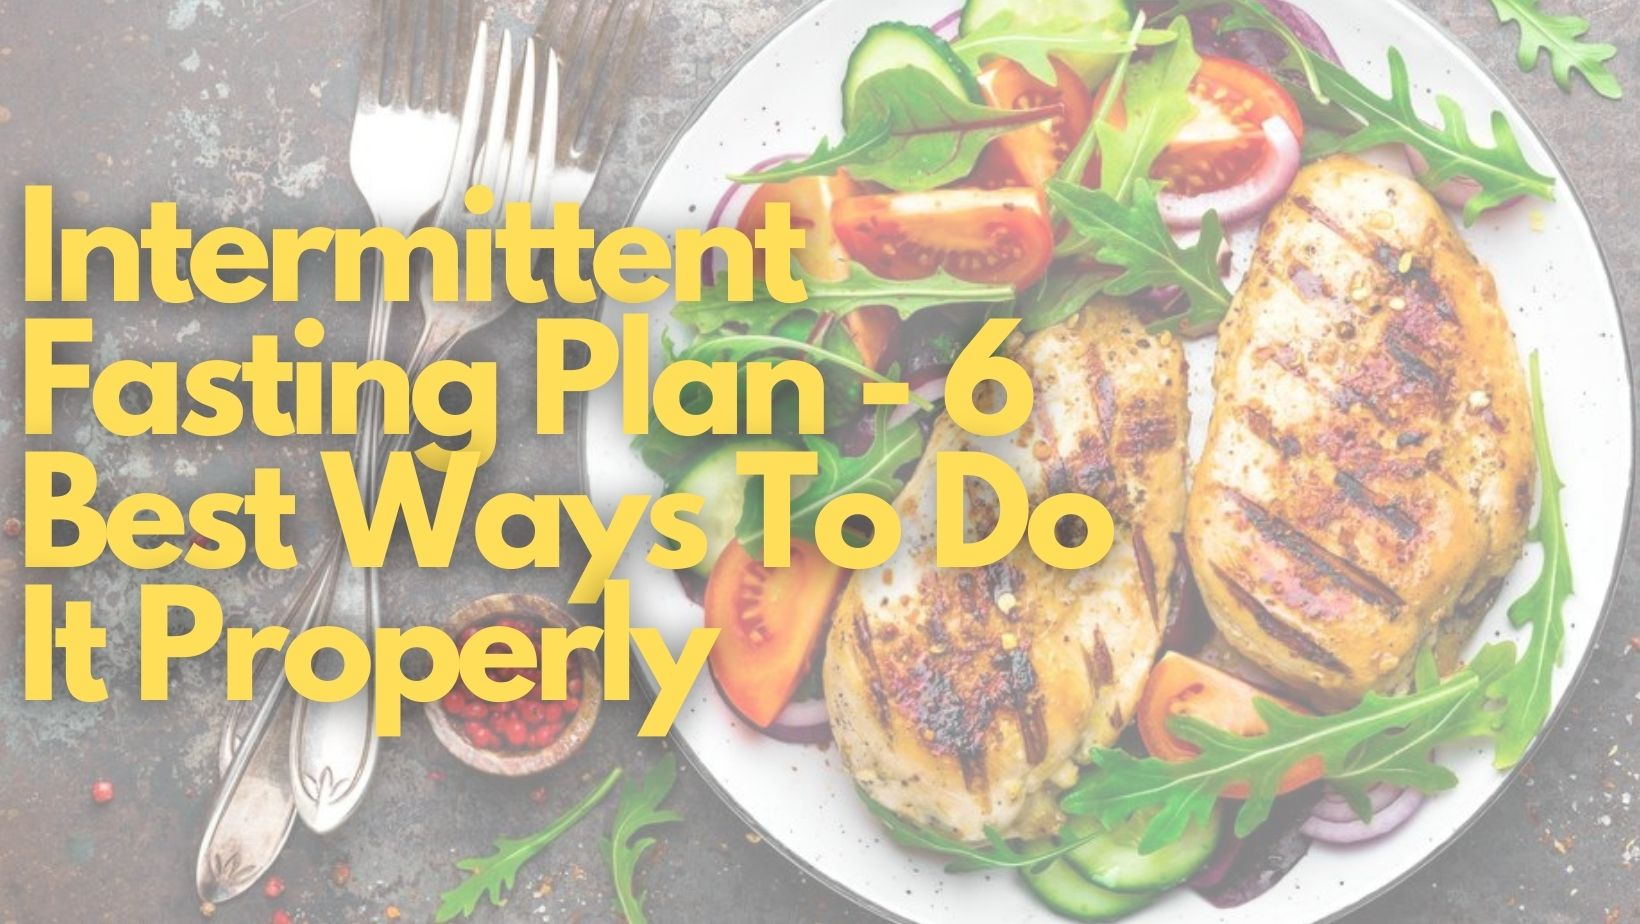 intermittent fasting plan